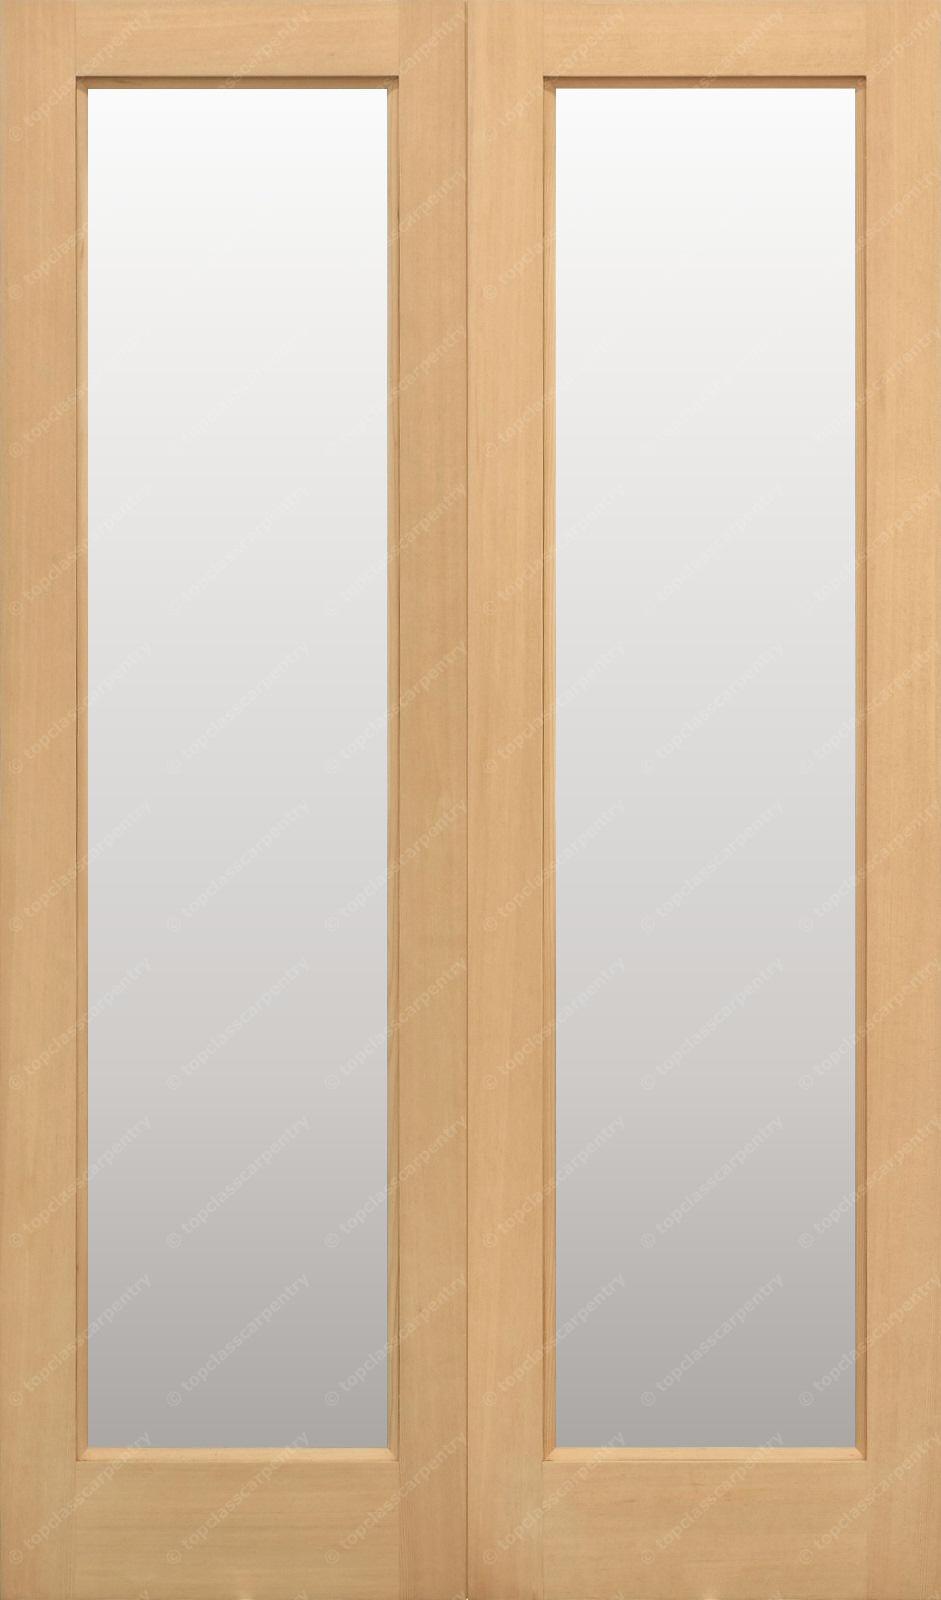 & 46 x 78 Hemlock E20 French Doors Clear Glazed